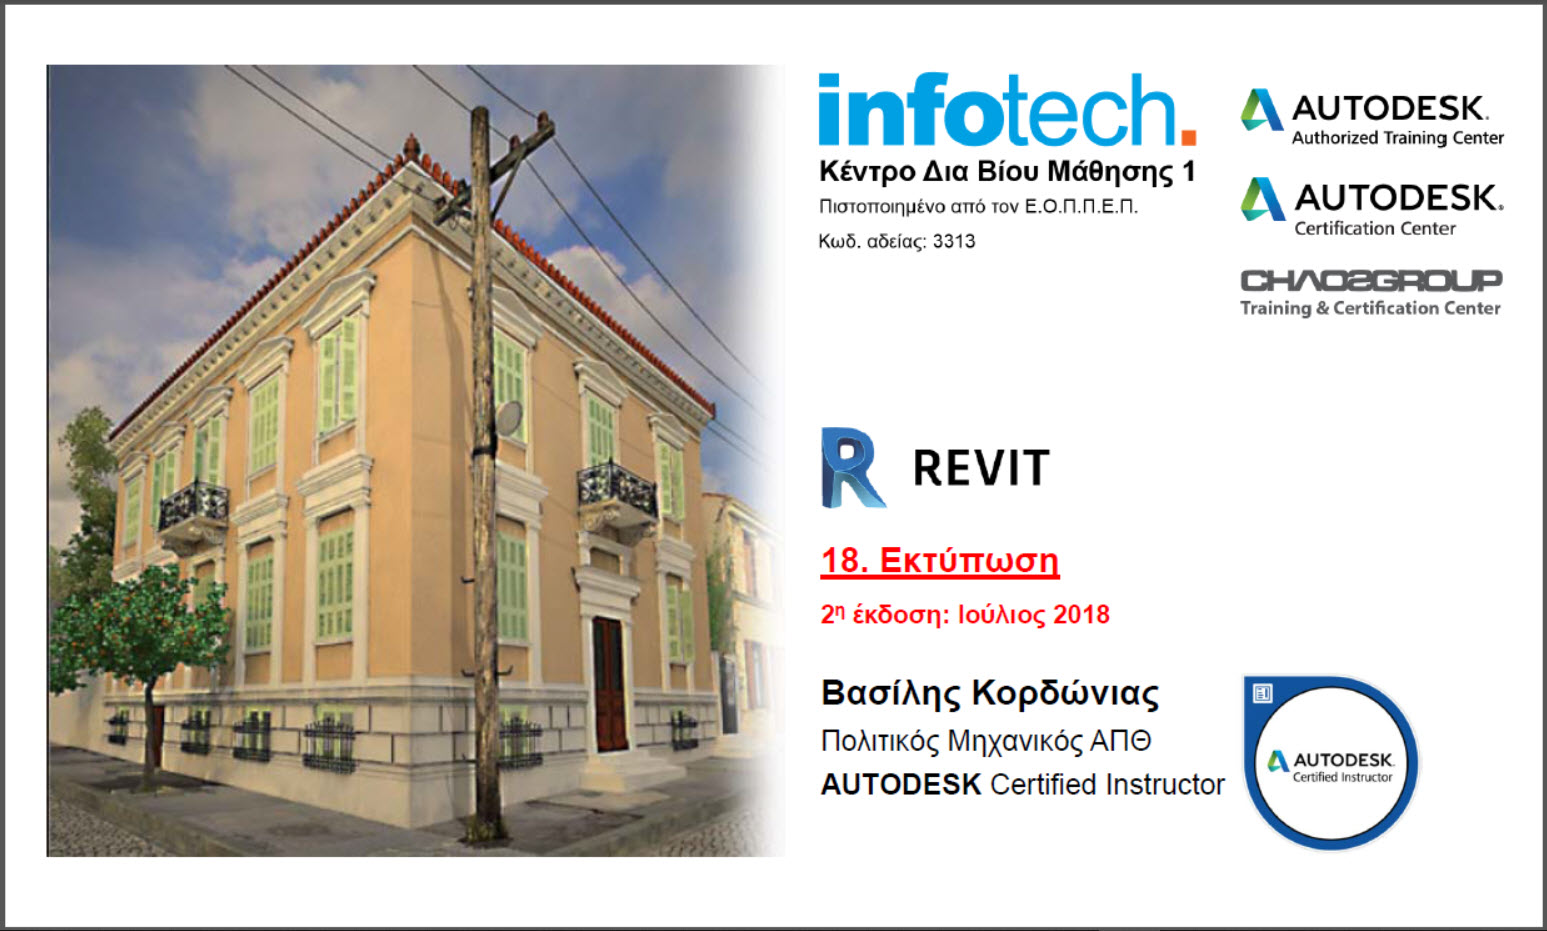 Revit Architecture. Νέες Παρουσιάσεις